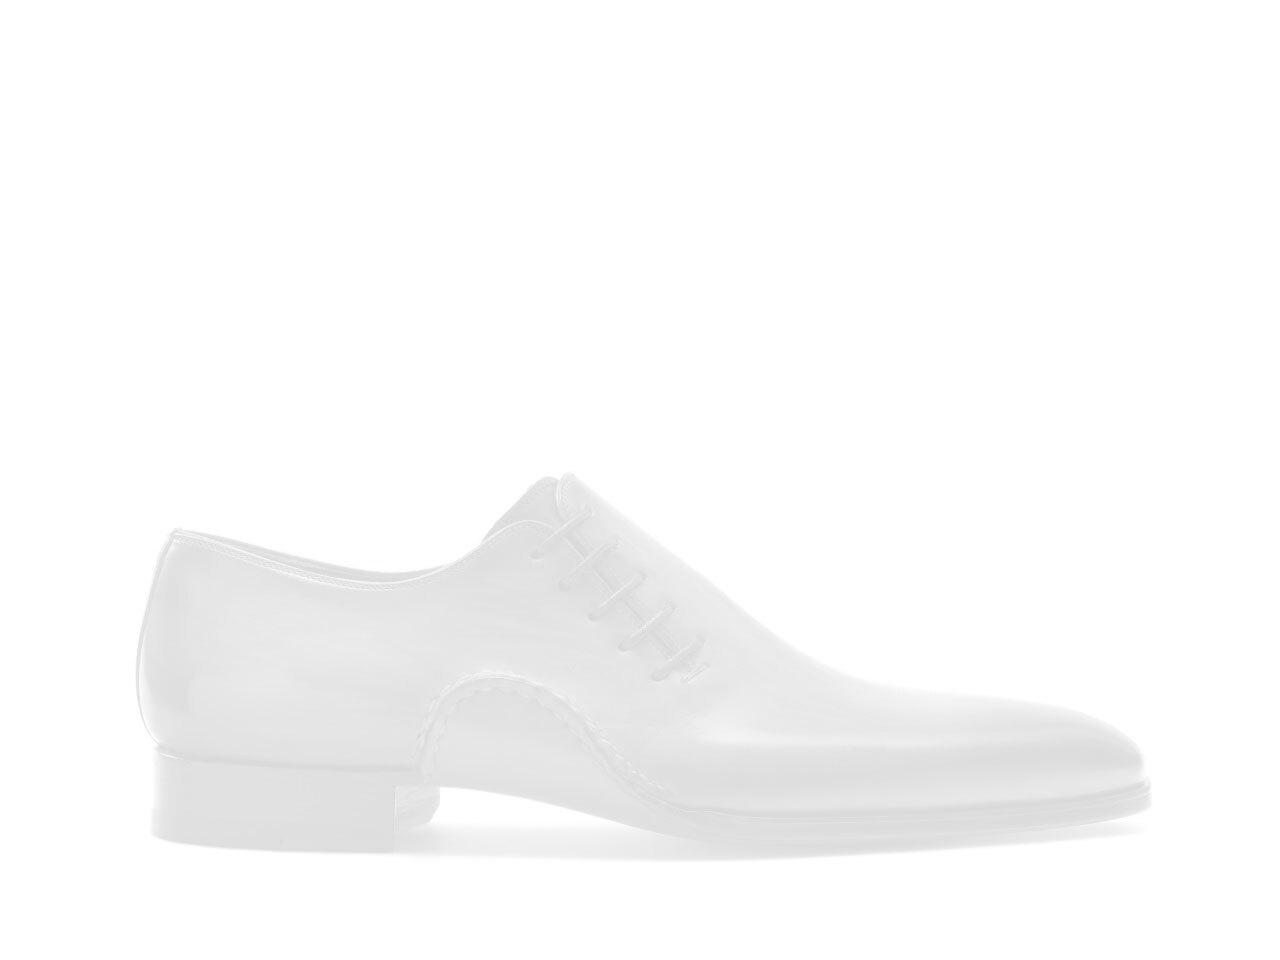 Cuero brown lace up brogue shoes for men - Magnanni